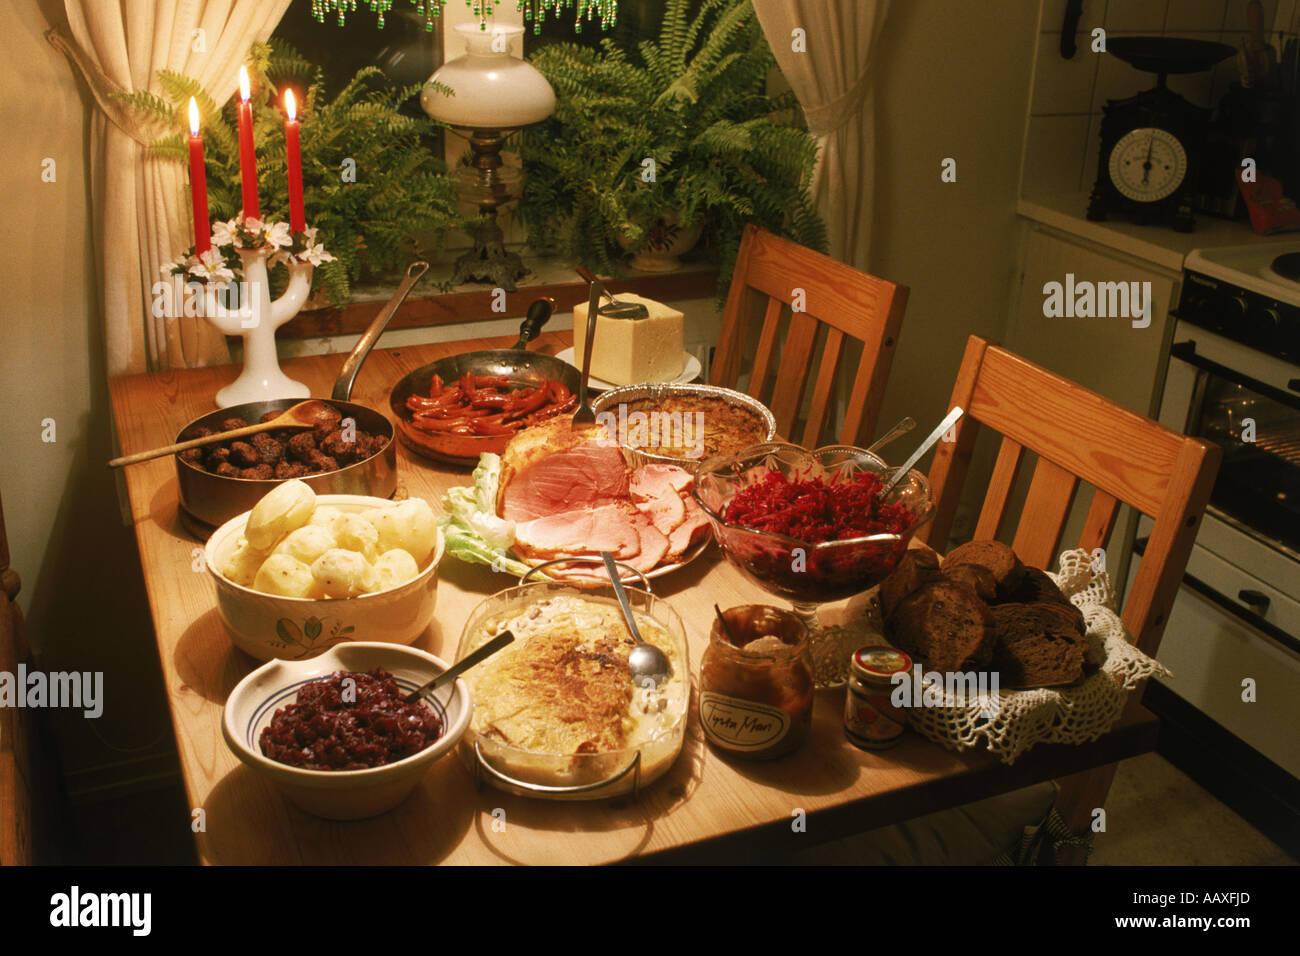 Swedish Christmas Bread.Swedish Christmas Table Or Julbord With Cheese Potatoes Beets